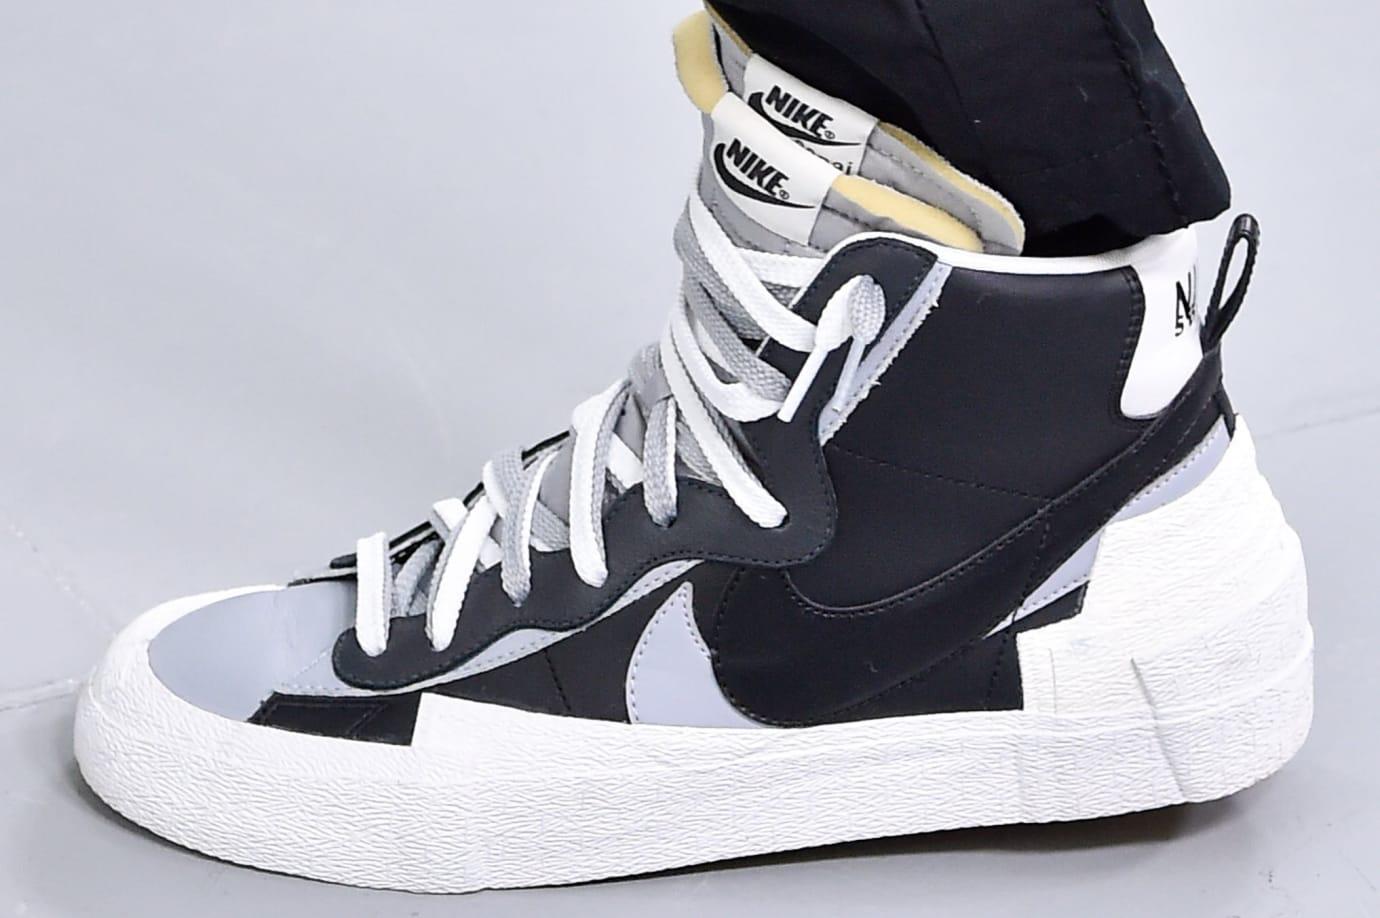 sacai-nike-hybrid-dunk-blazer-black-lateral